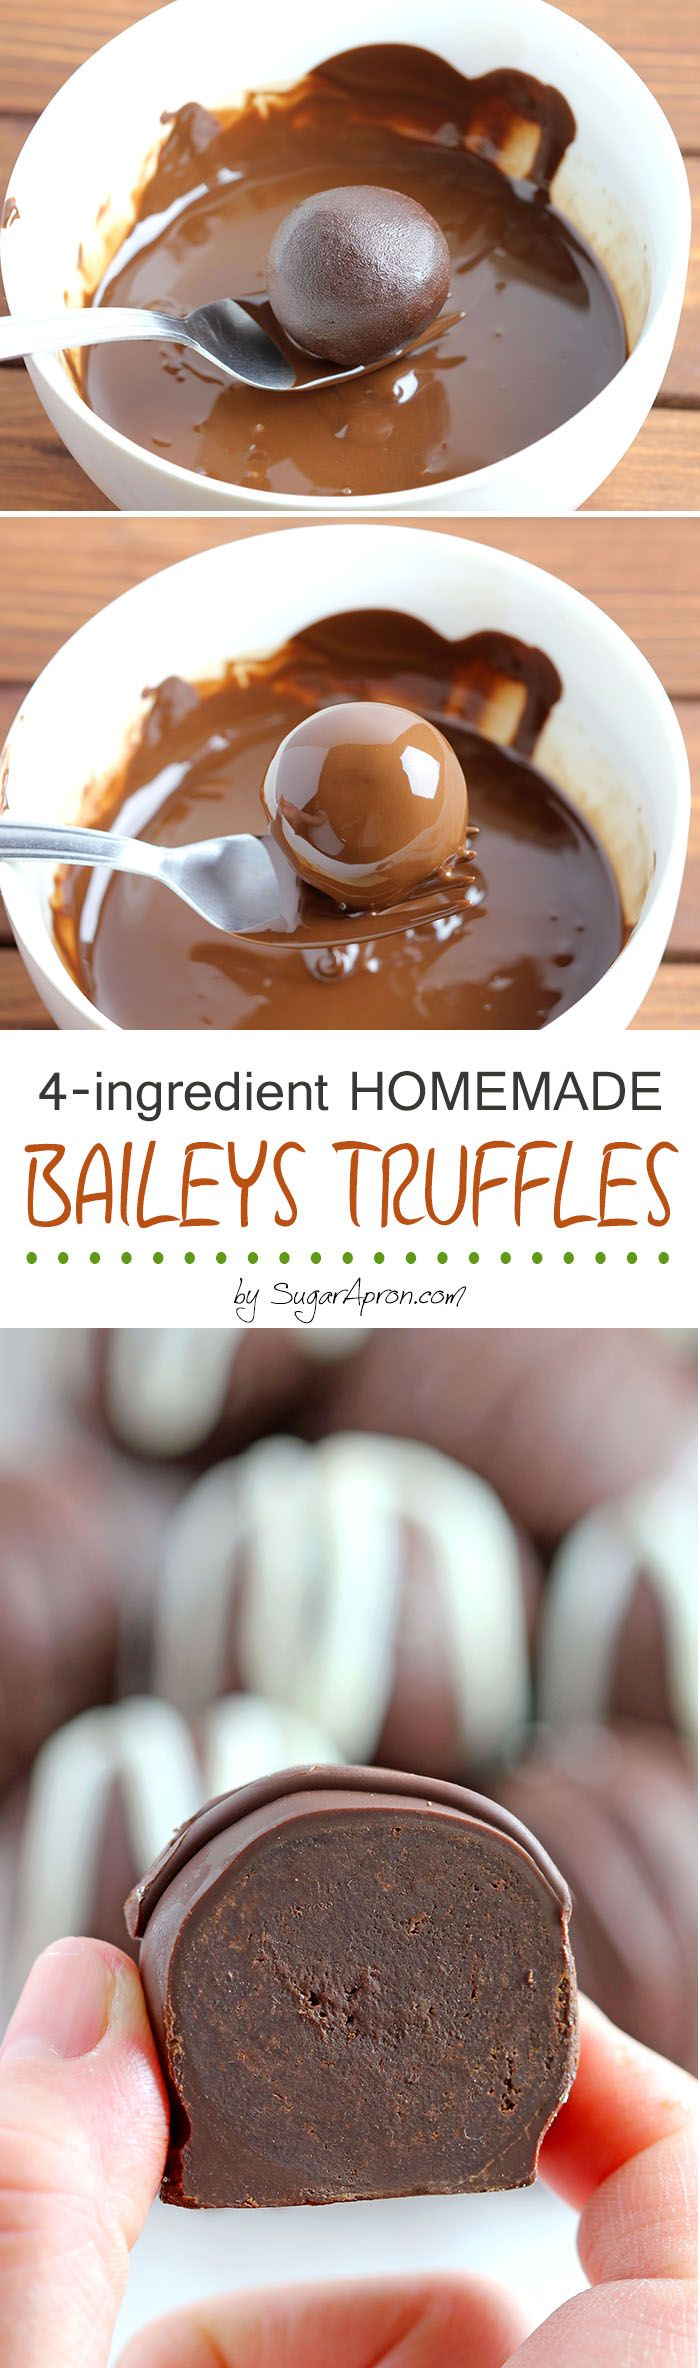 Homemade Baileys Truffles